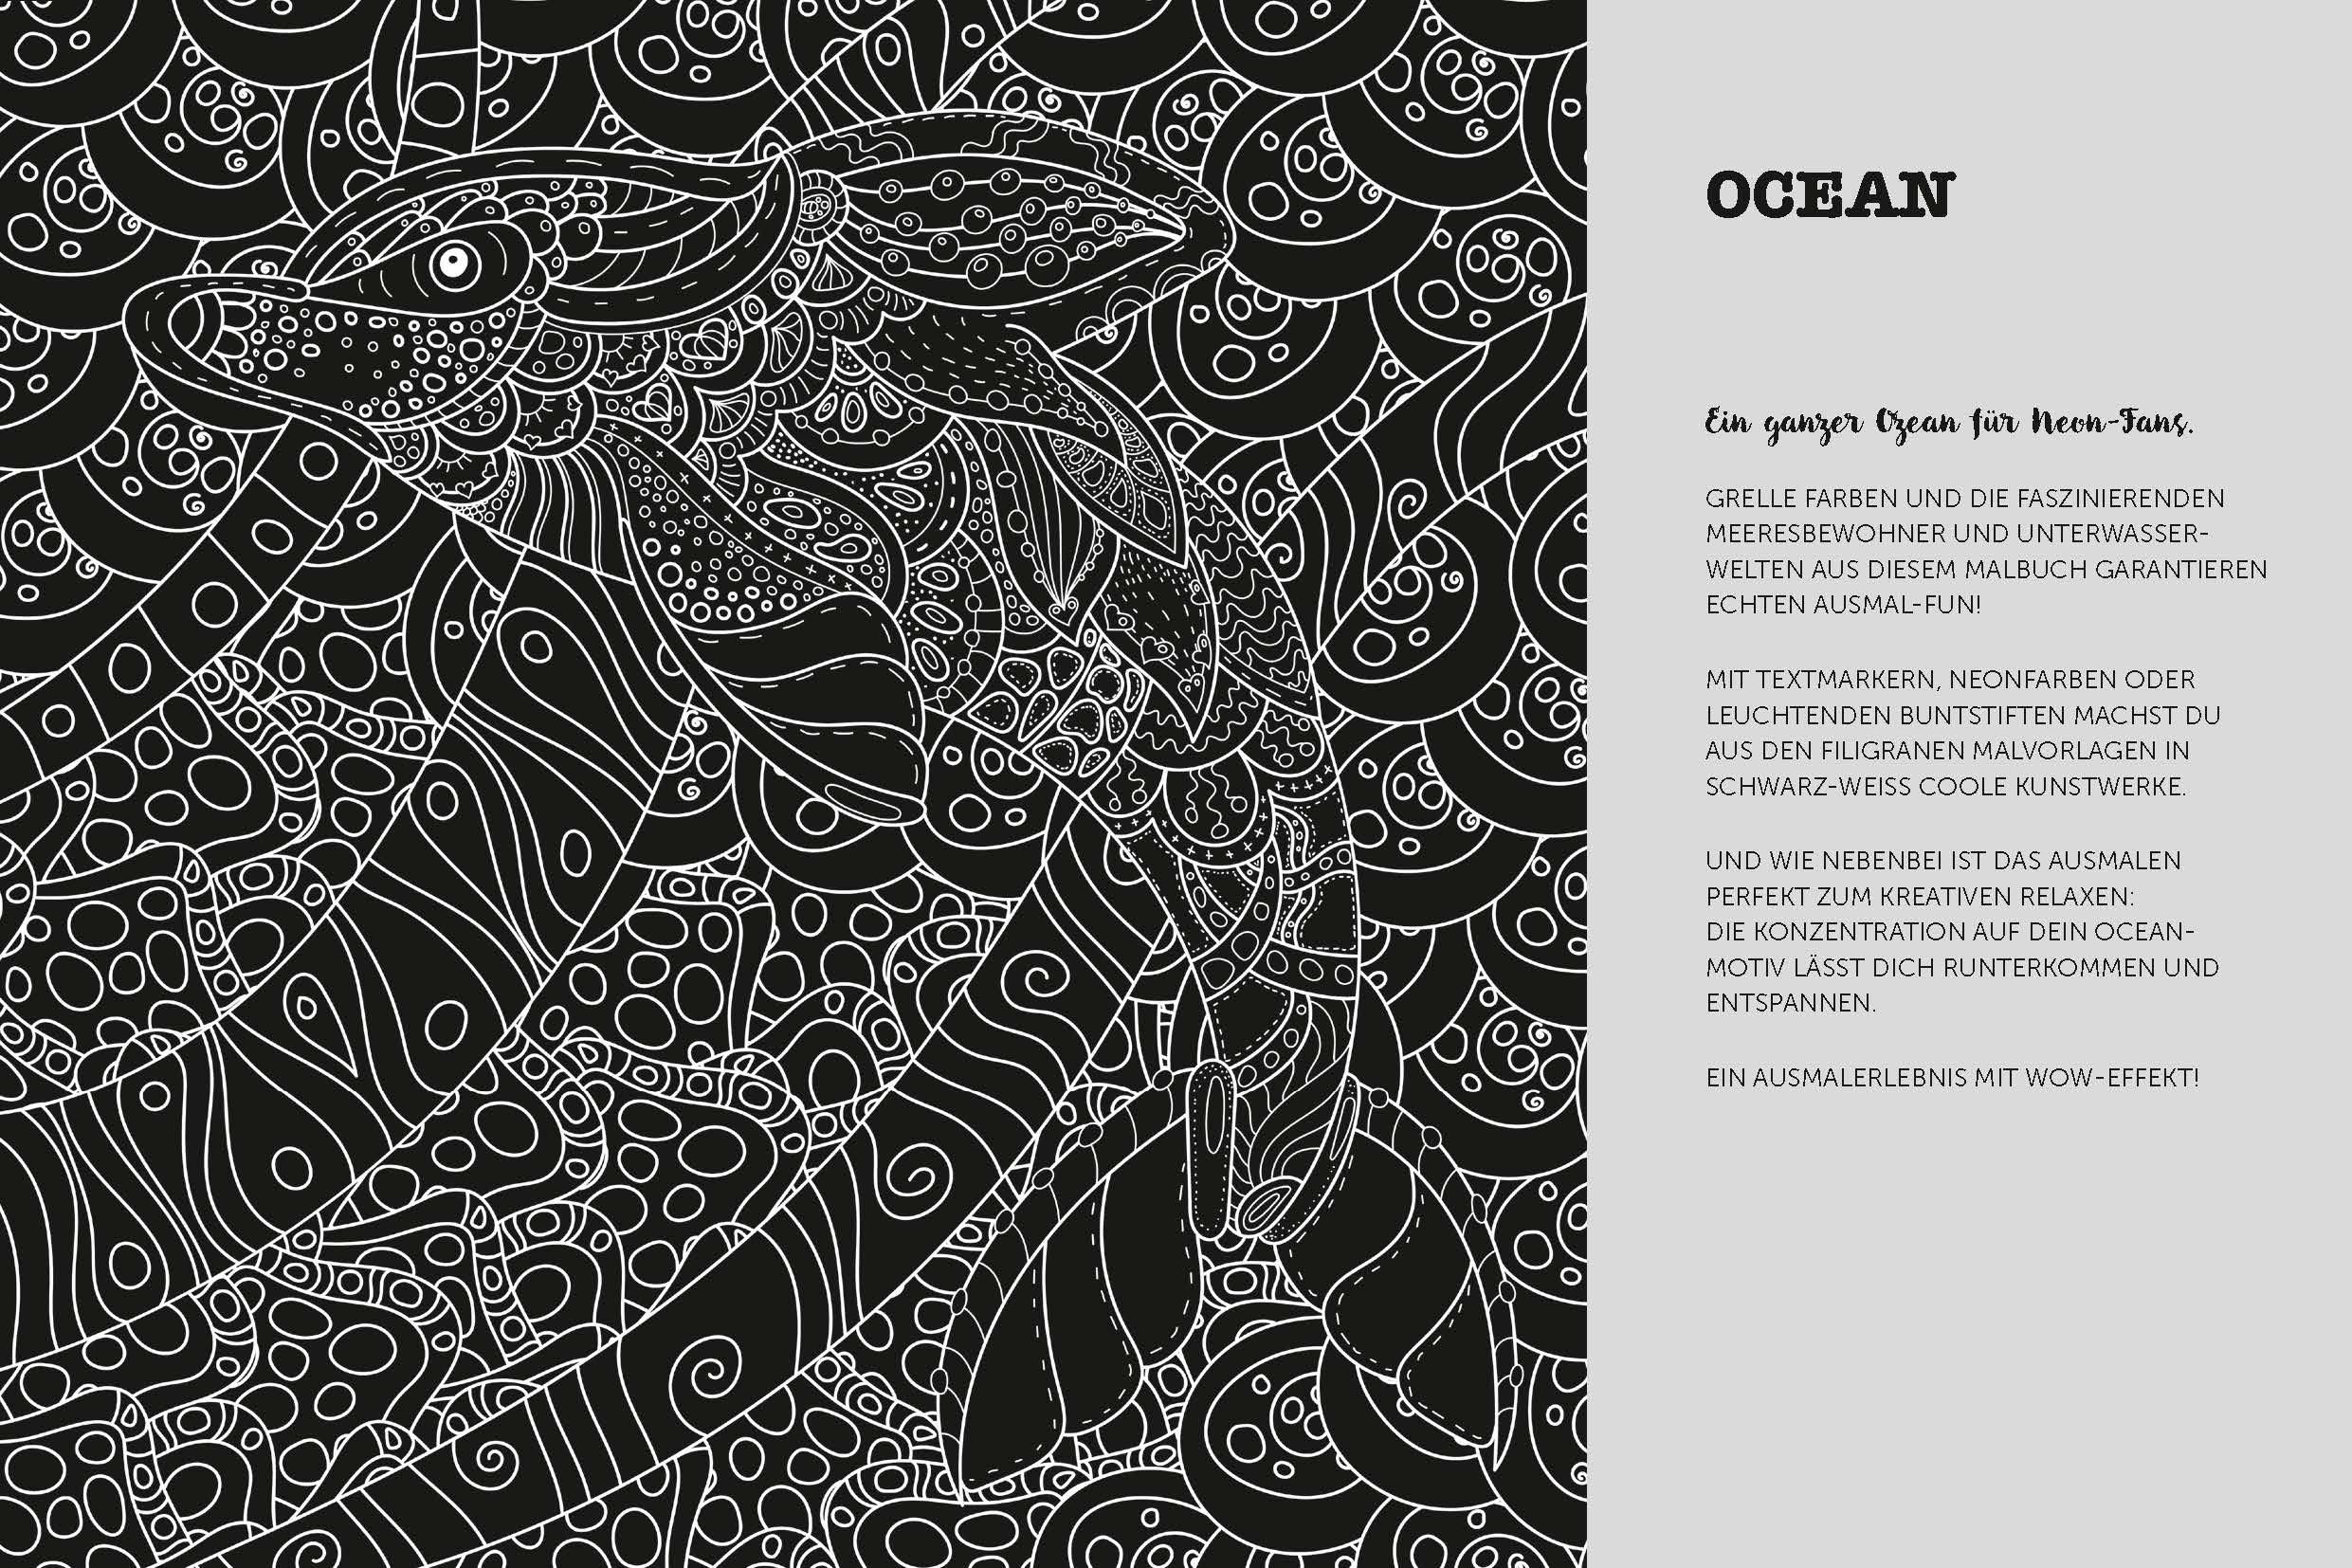 Ocean Neon-Ausmalbuch: Amazon.de: Bücher